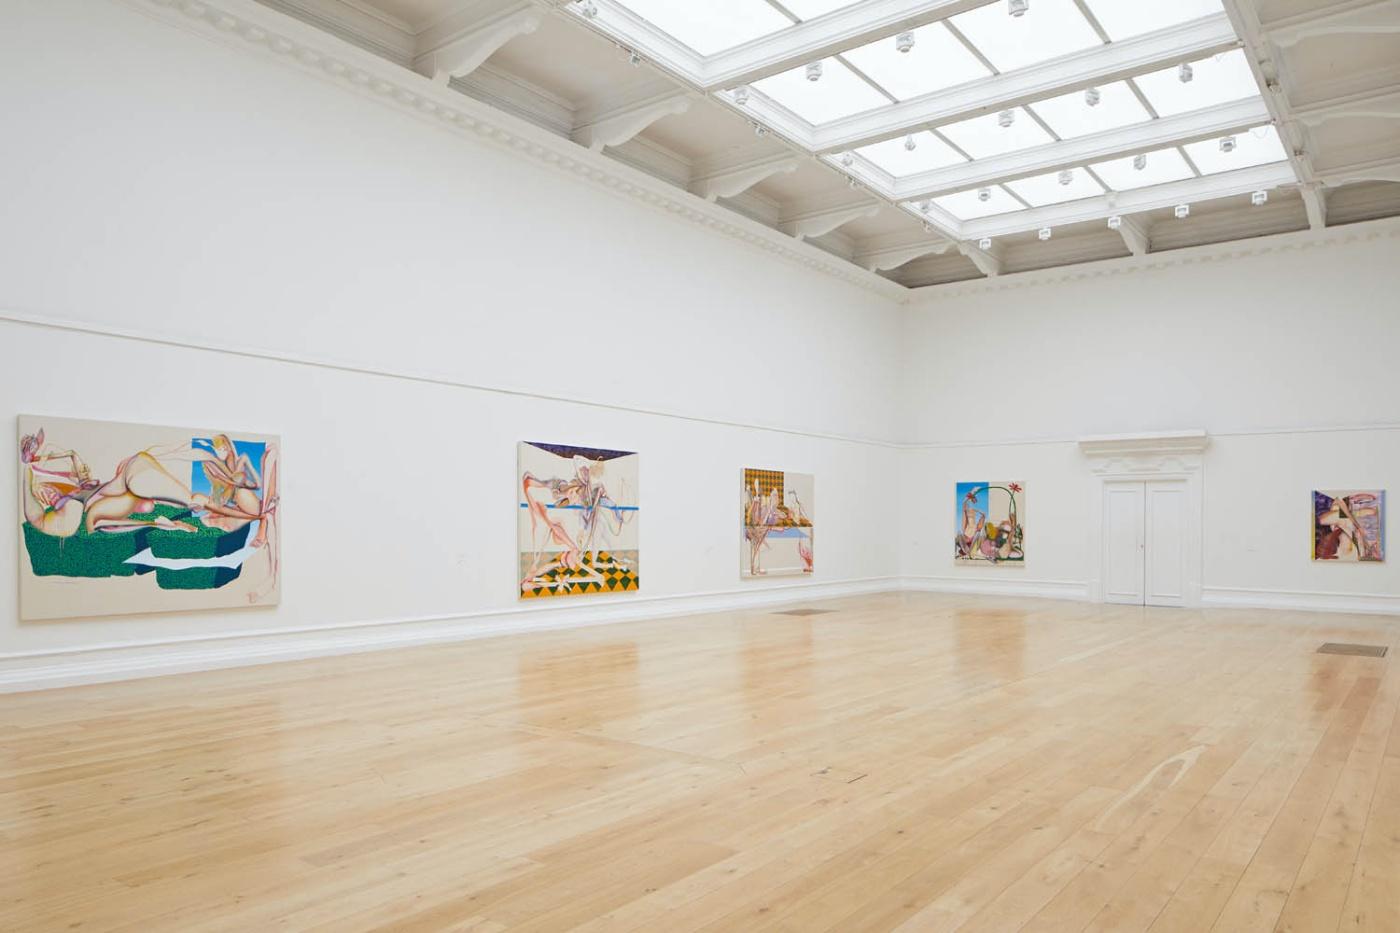 South London Gallery Christina Quarles 5